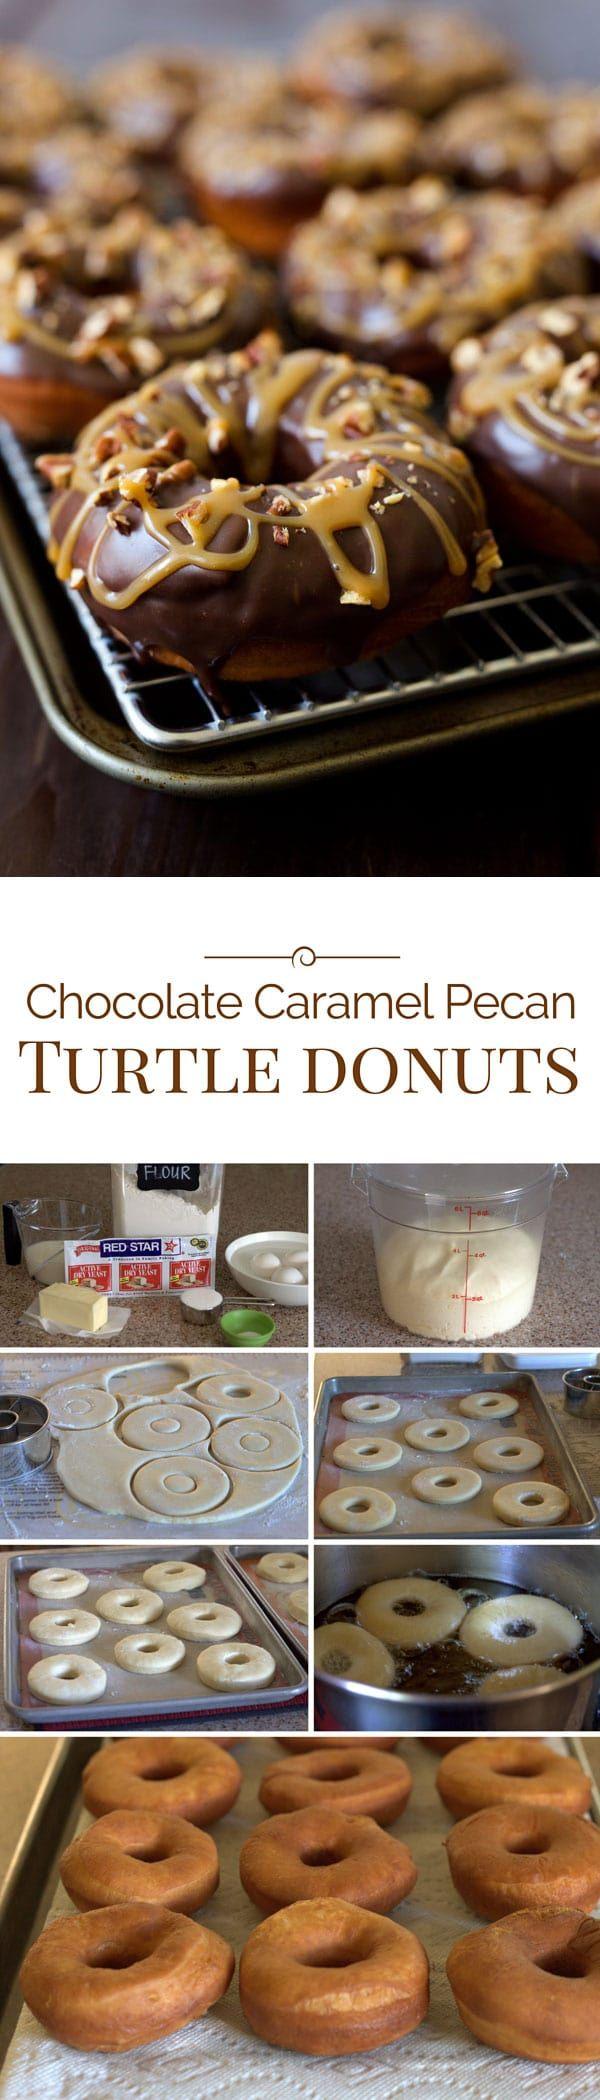 Best 25 Donut Shop Ideas On Pinterest Donuts Donuts